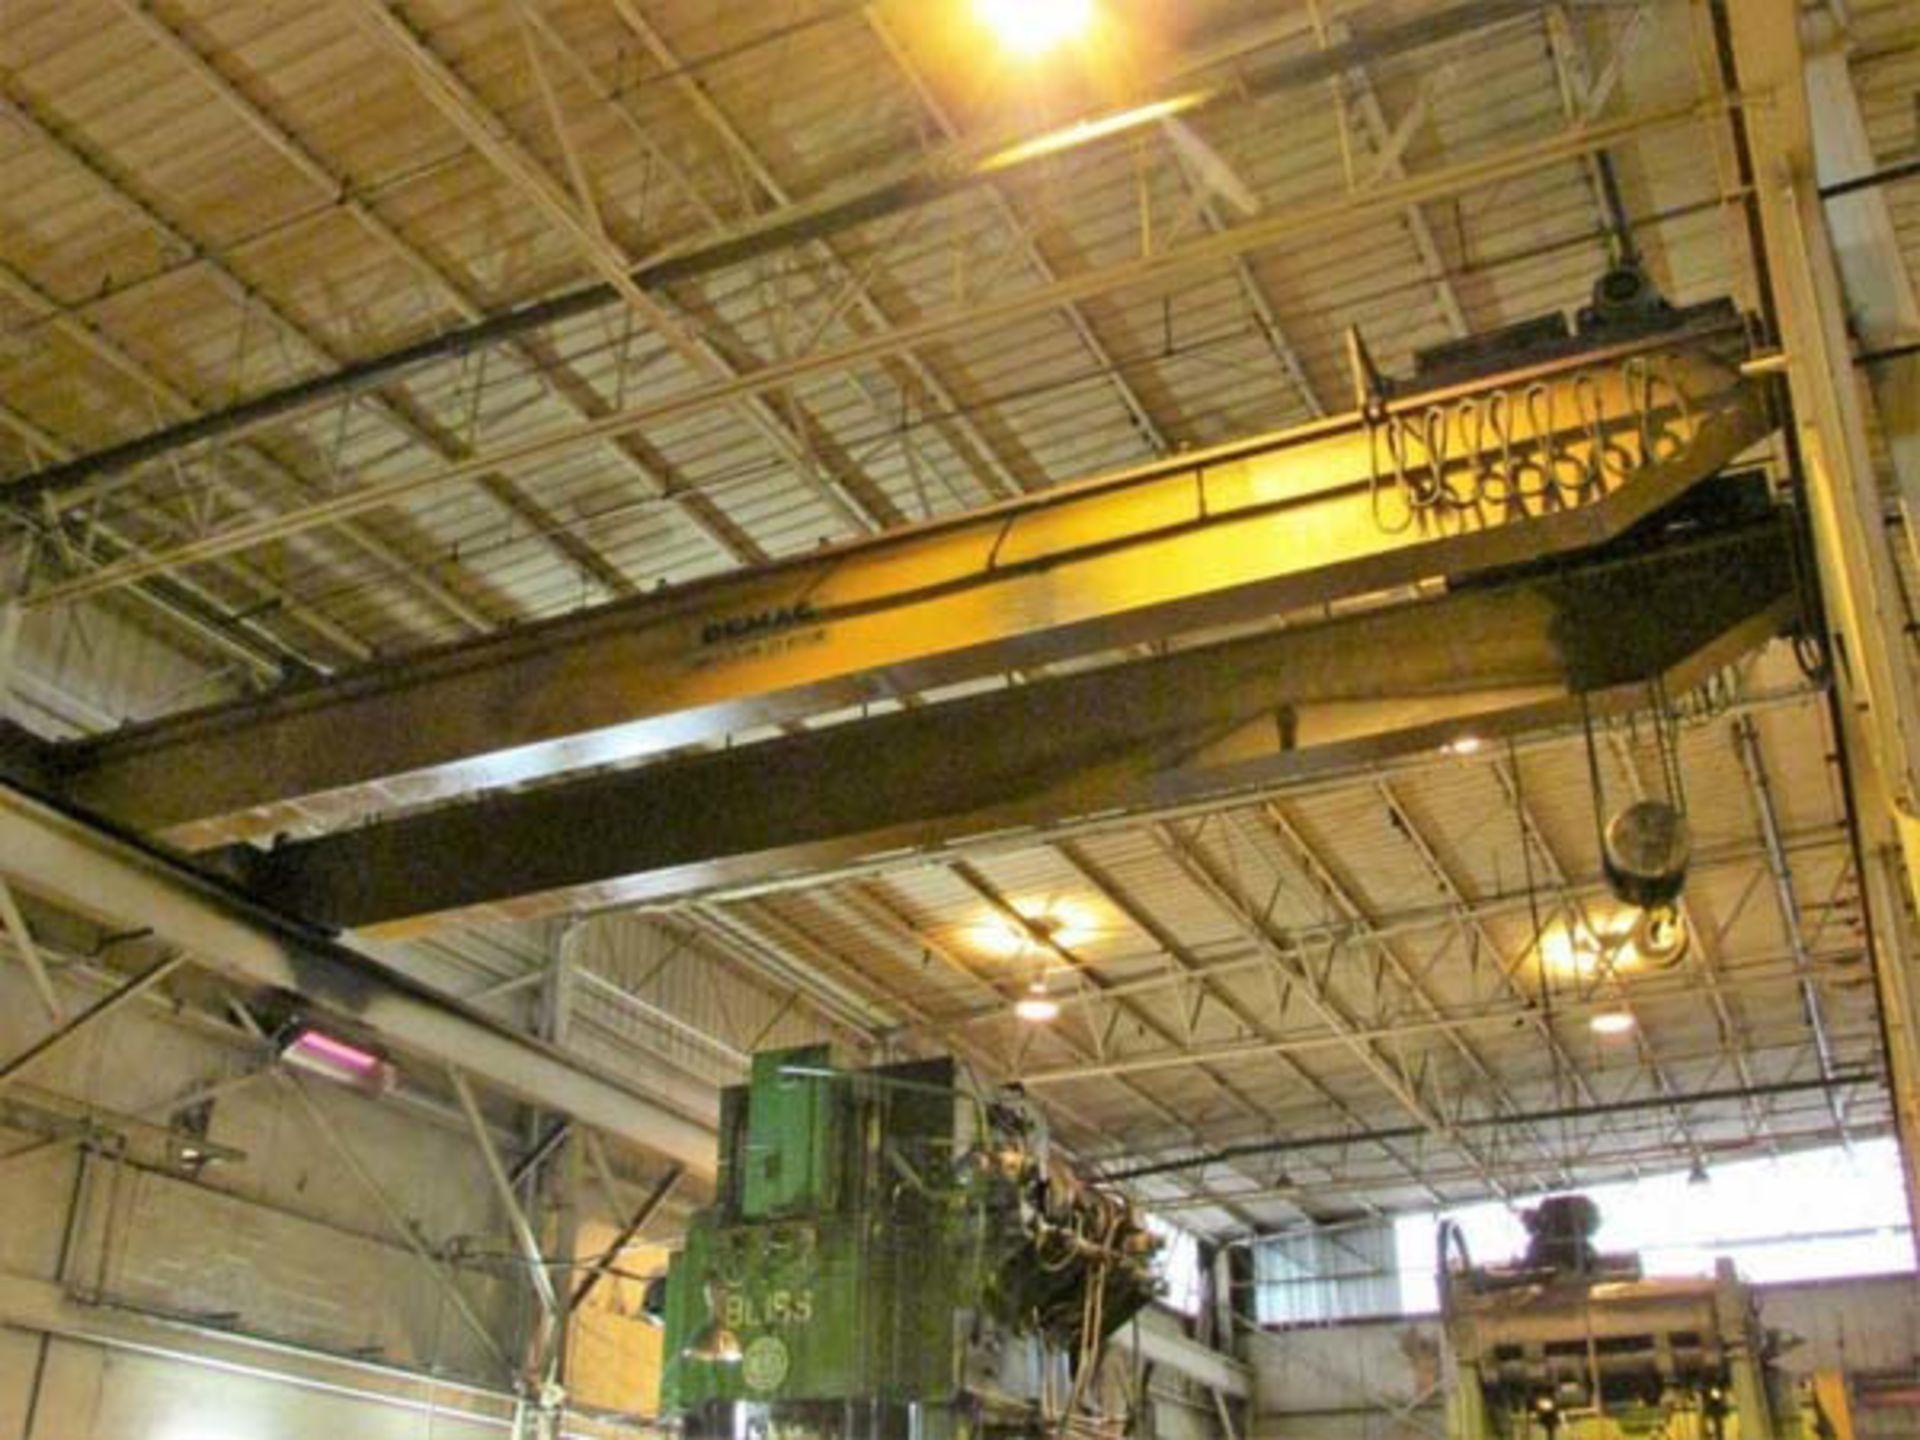 Demag Top Riding Double Girder Bridge Crane | 25-Ton x 50', Mdl: N/A, S/N: 75066 - 8398P - Image 3 of 10